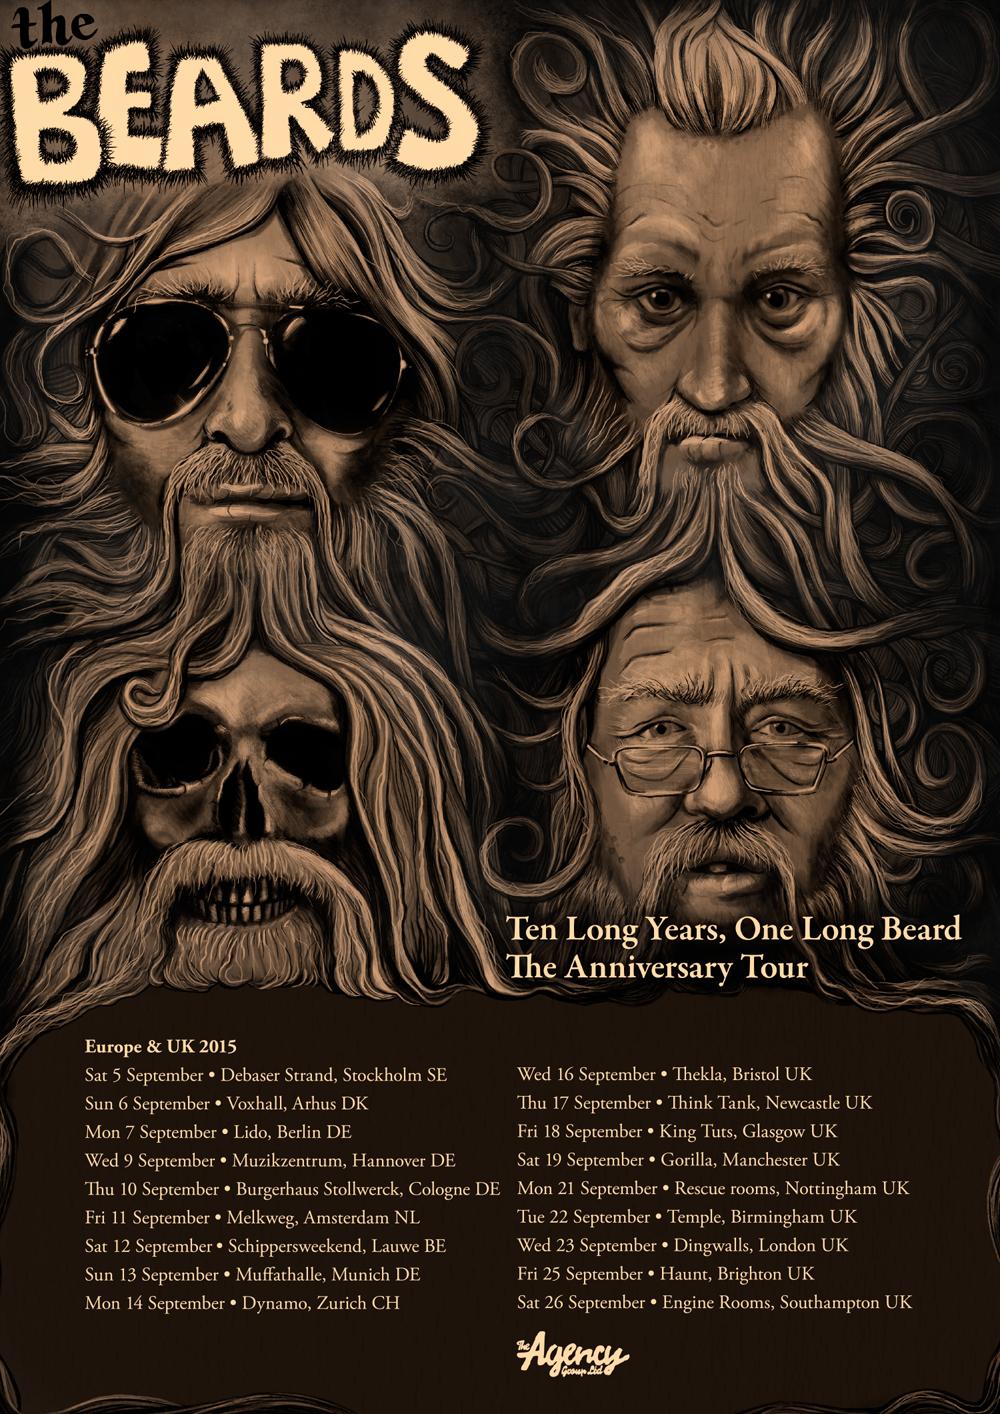 The Beards_10 long years_All Europe_WEB_v002